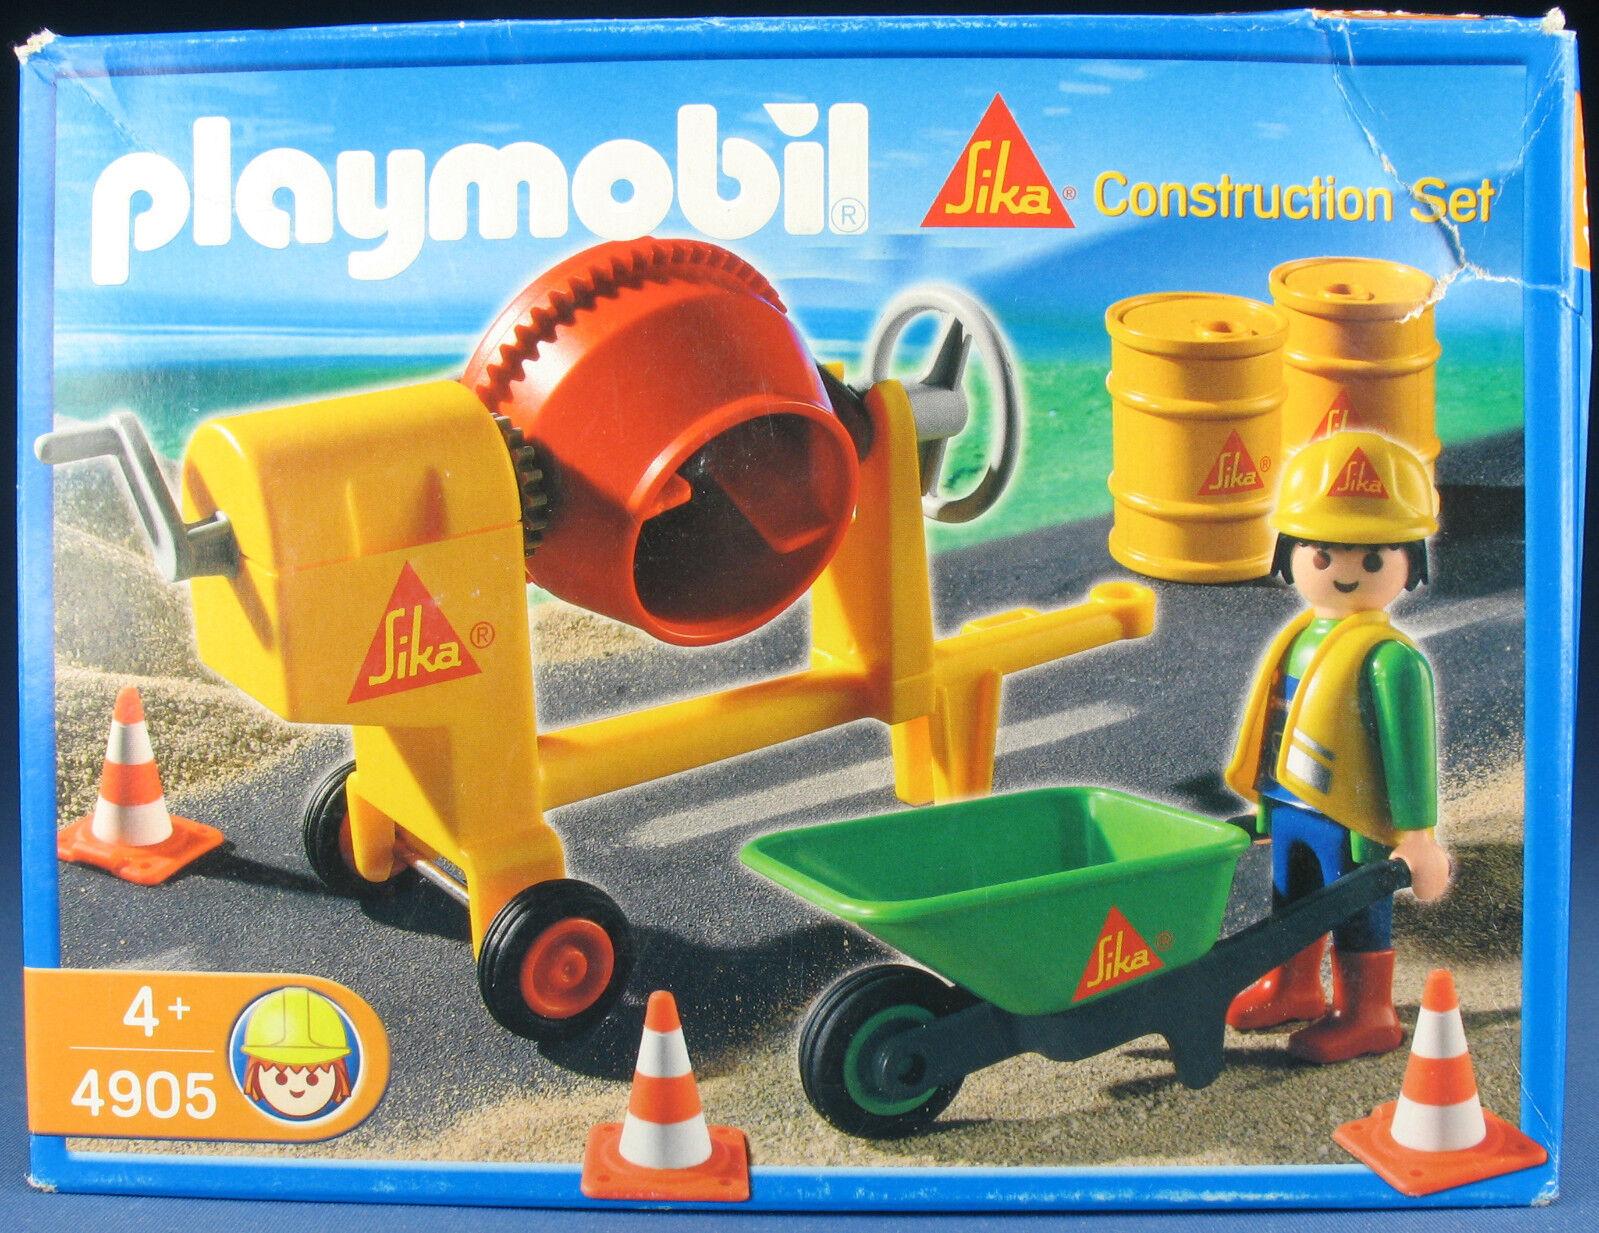 PLAYMOBIL 4905 - Sika - Baustelle Construction Promo Set - 2008 - NEU - New MISB